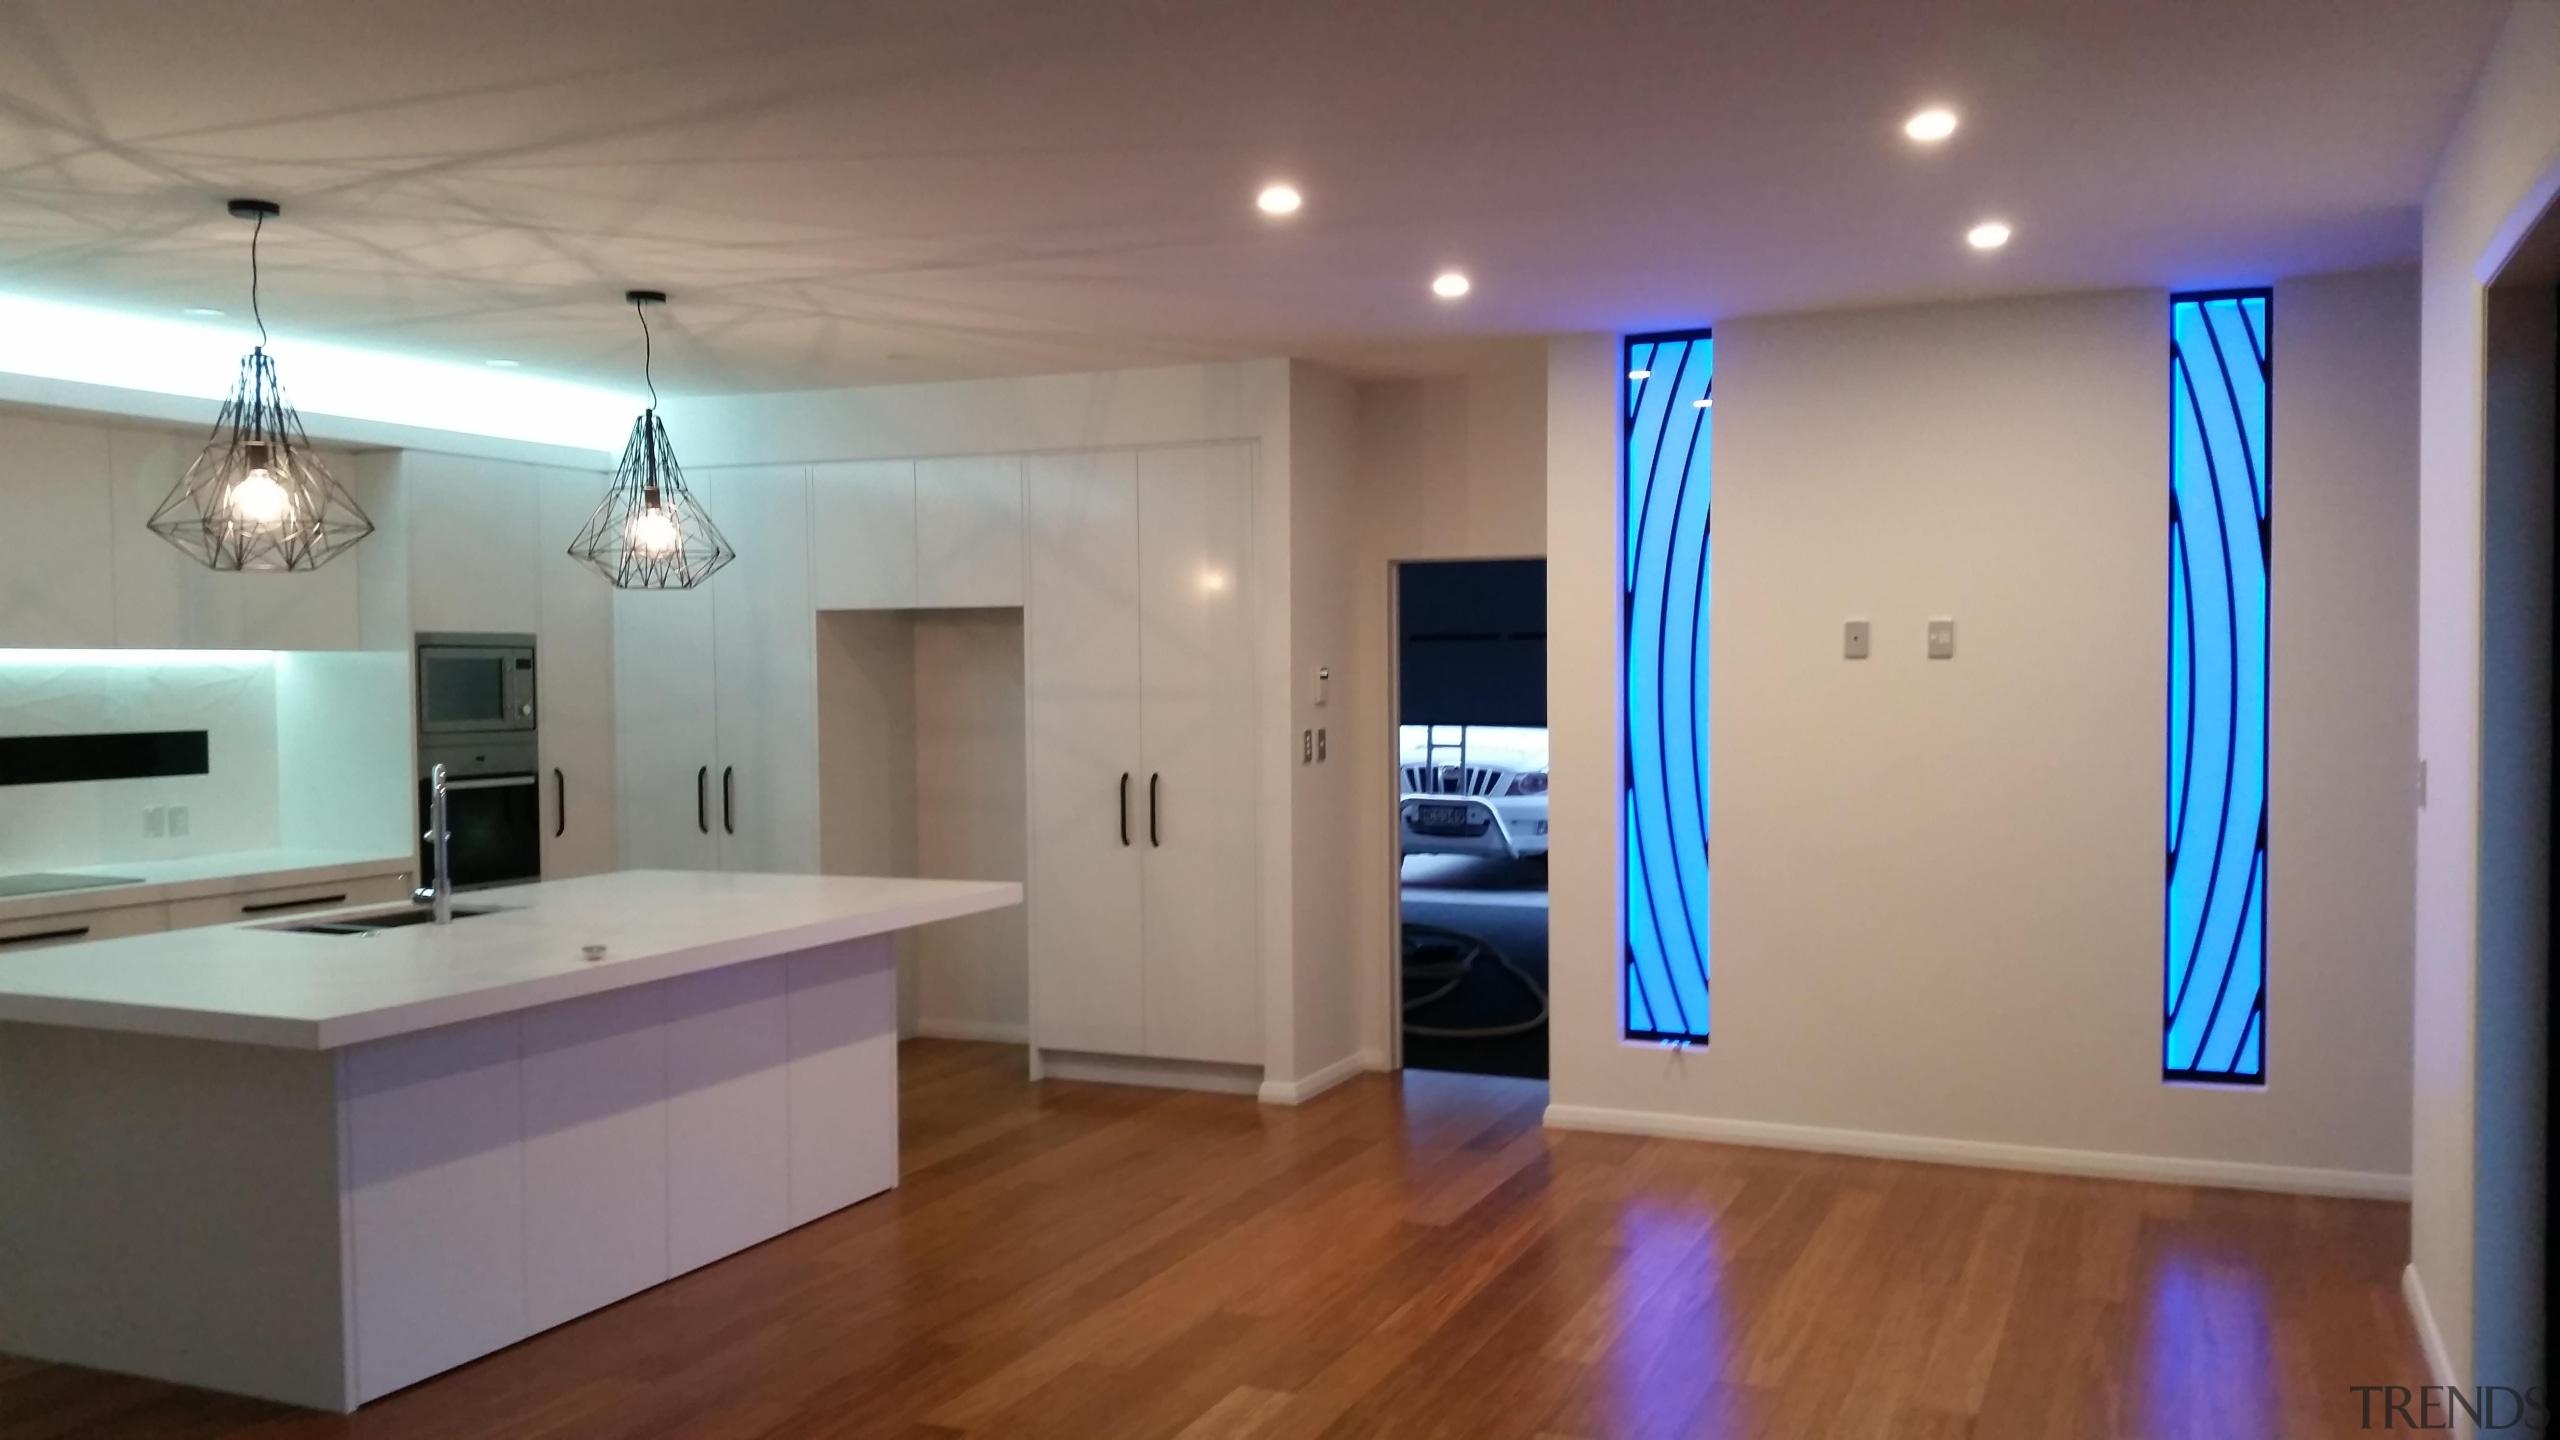 Colourful glass splashbacks create a dynamic backdrop in ceiling, floor, flooring, hardwood, home, interior design, lighting, property, real estate, room, wood flooring, gray